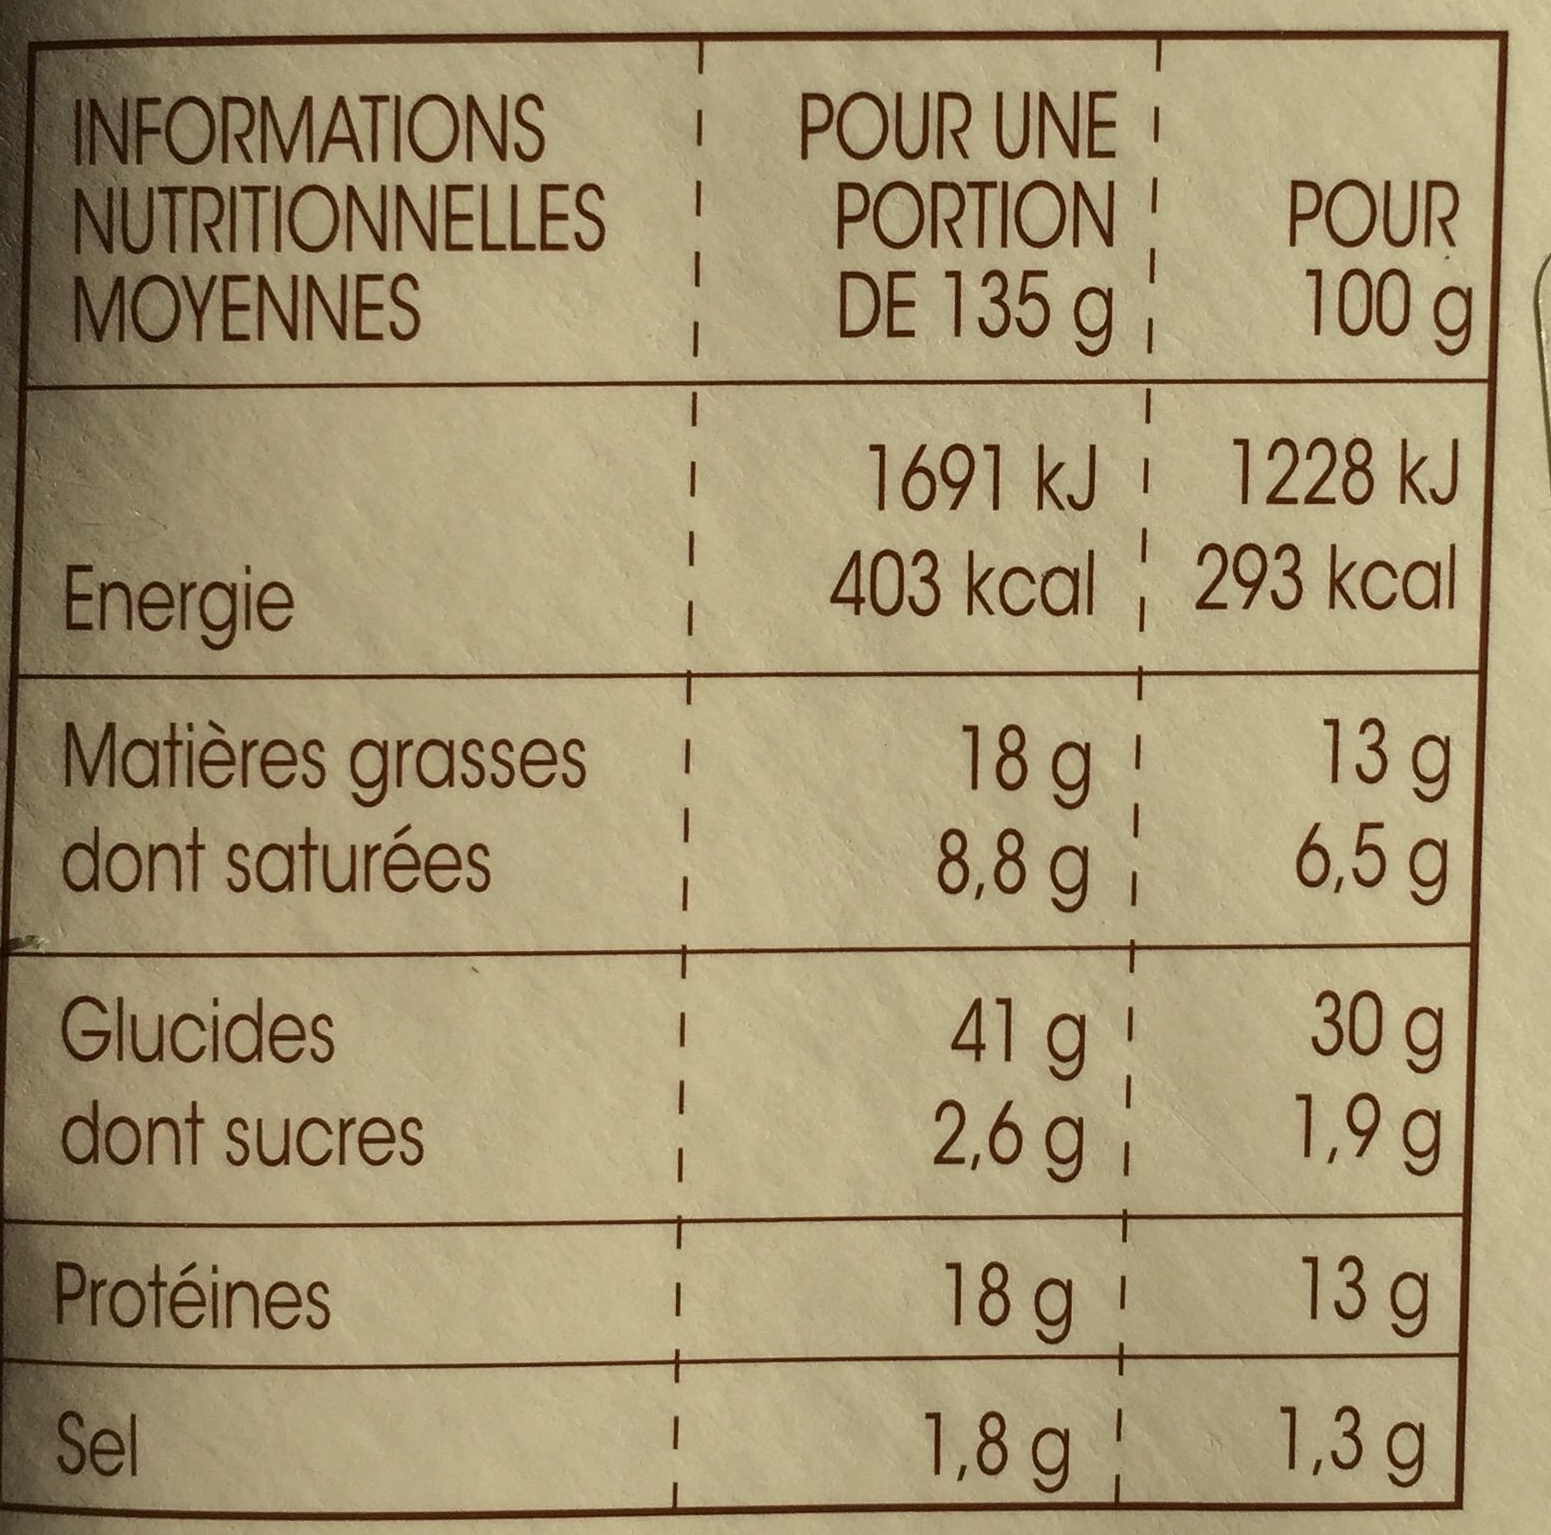 Le jambon emmental - Informations nutritionnelles - fr